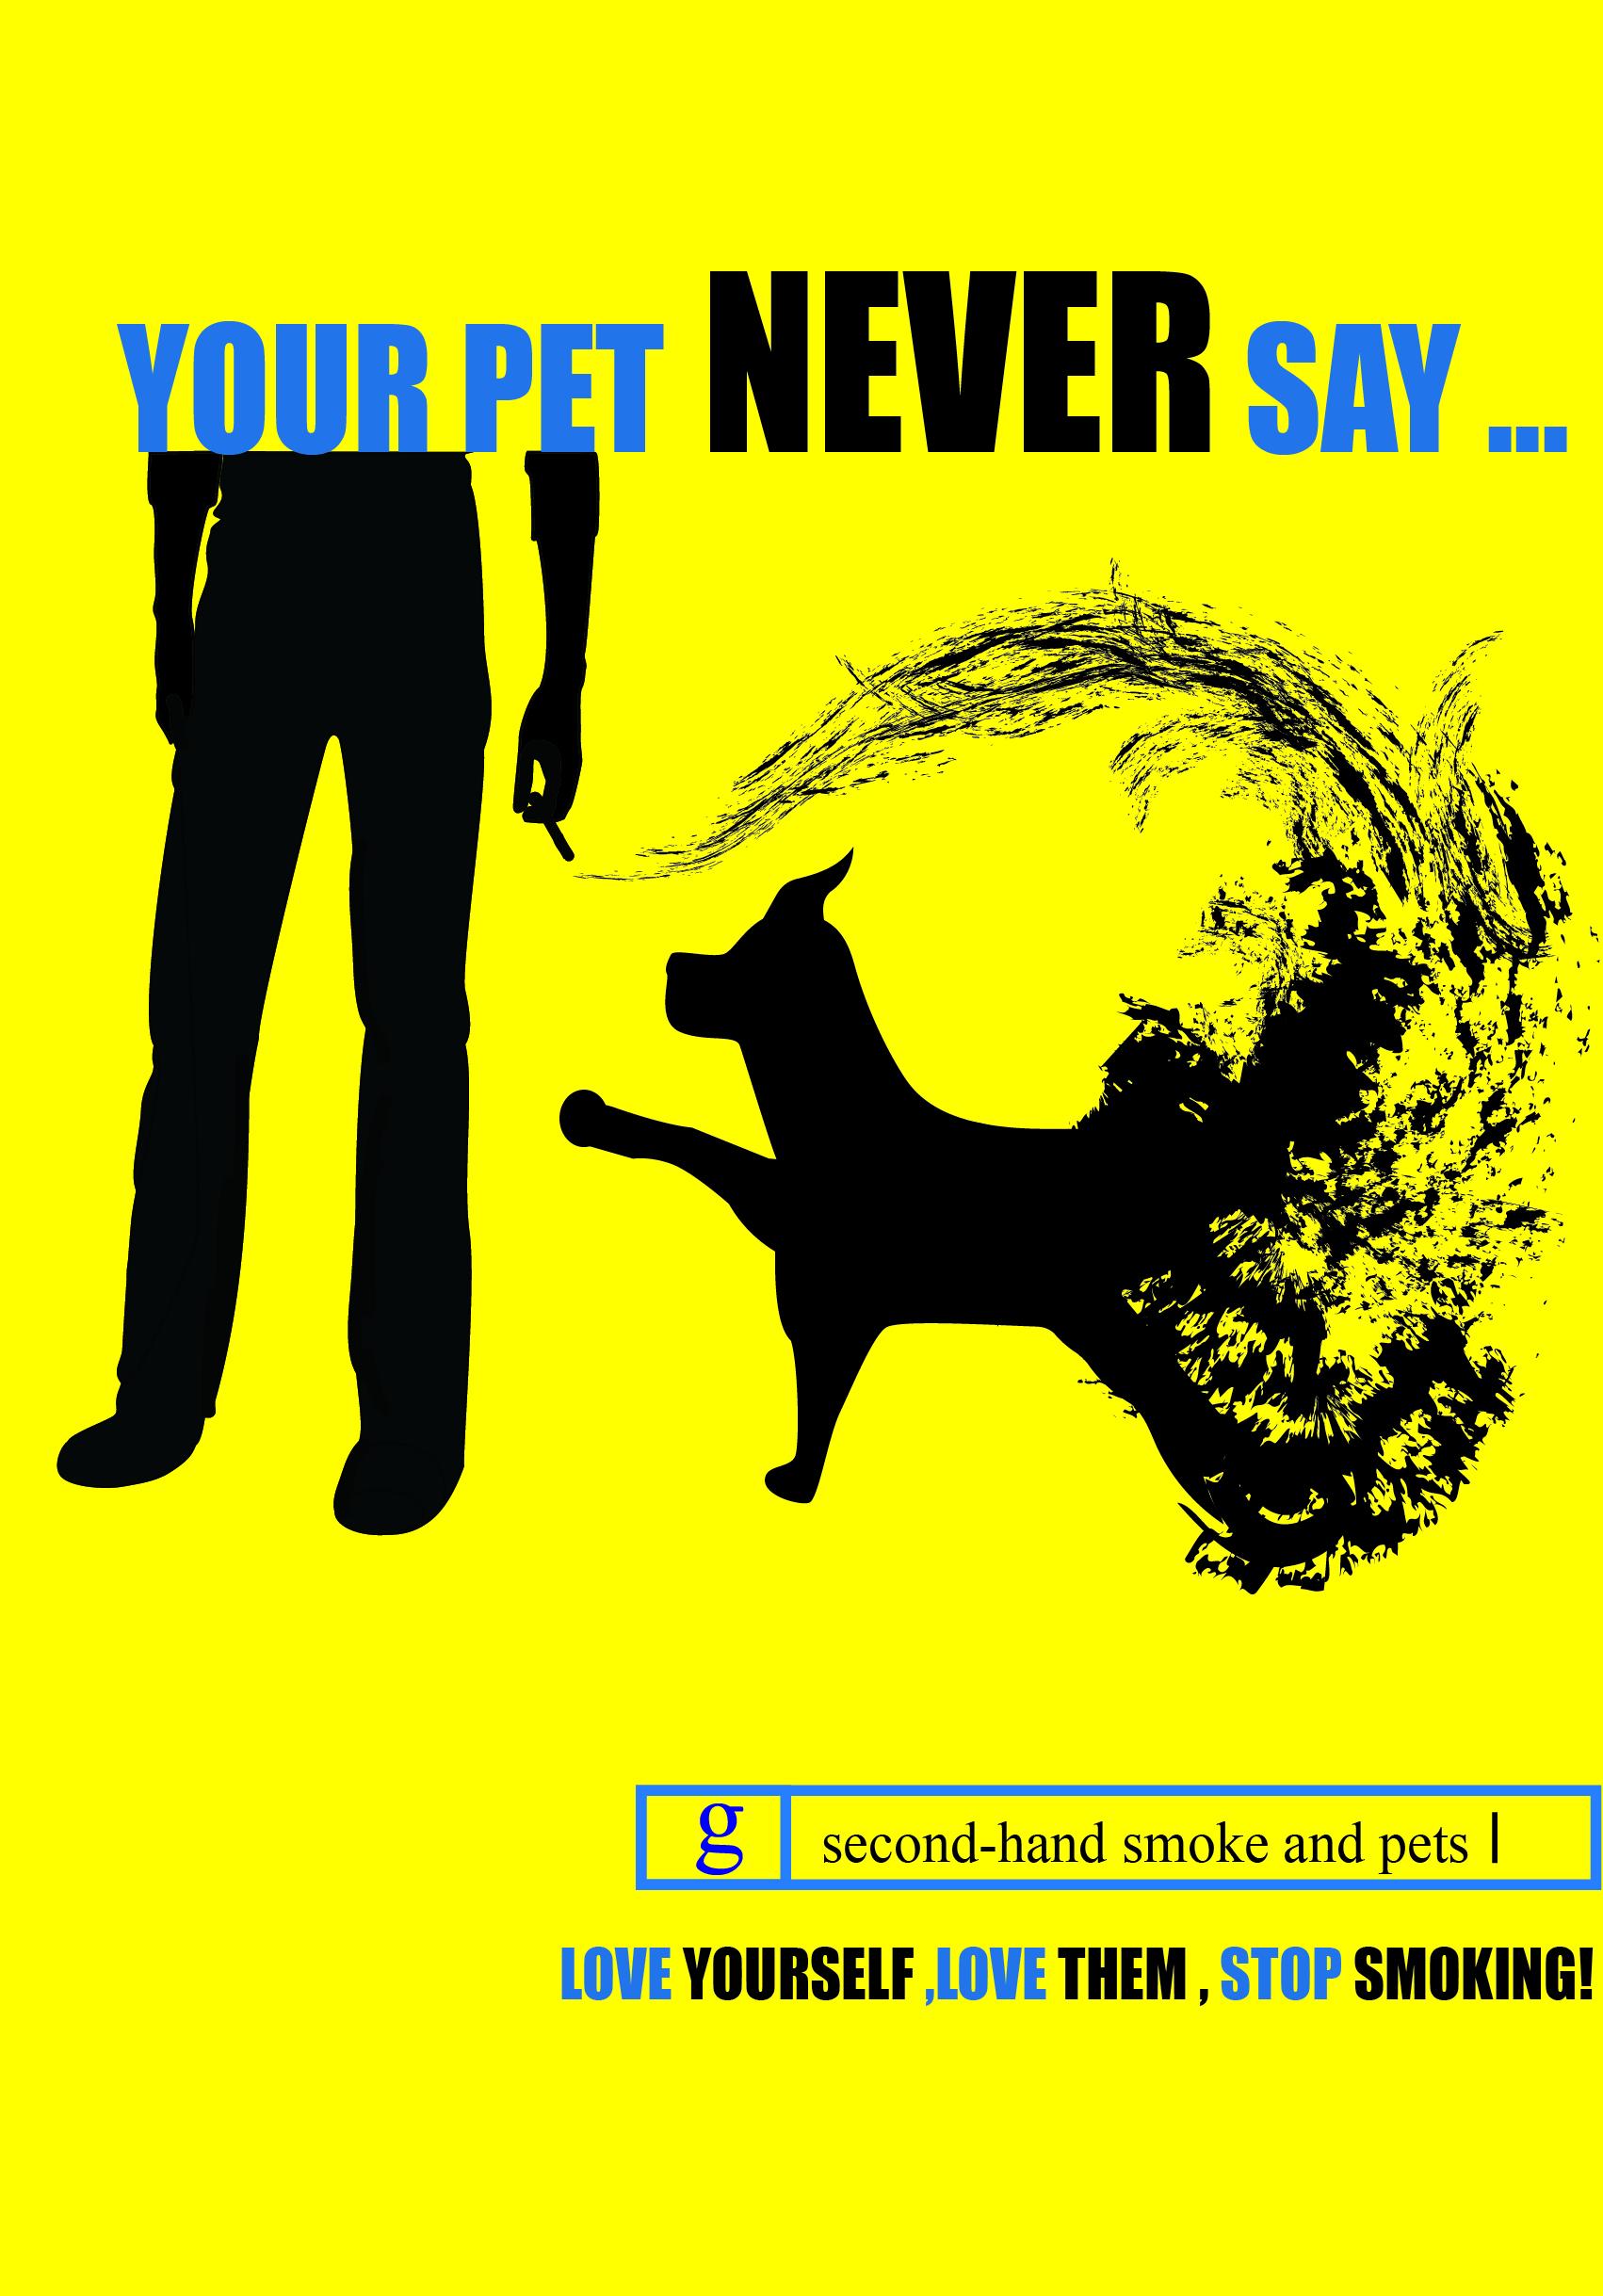 Your pet never say....(2014無菸設計大賞平面組-佳作)